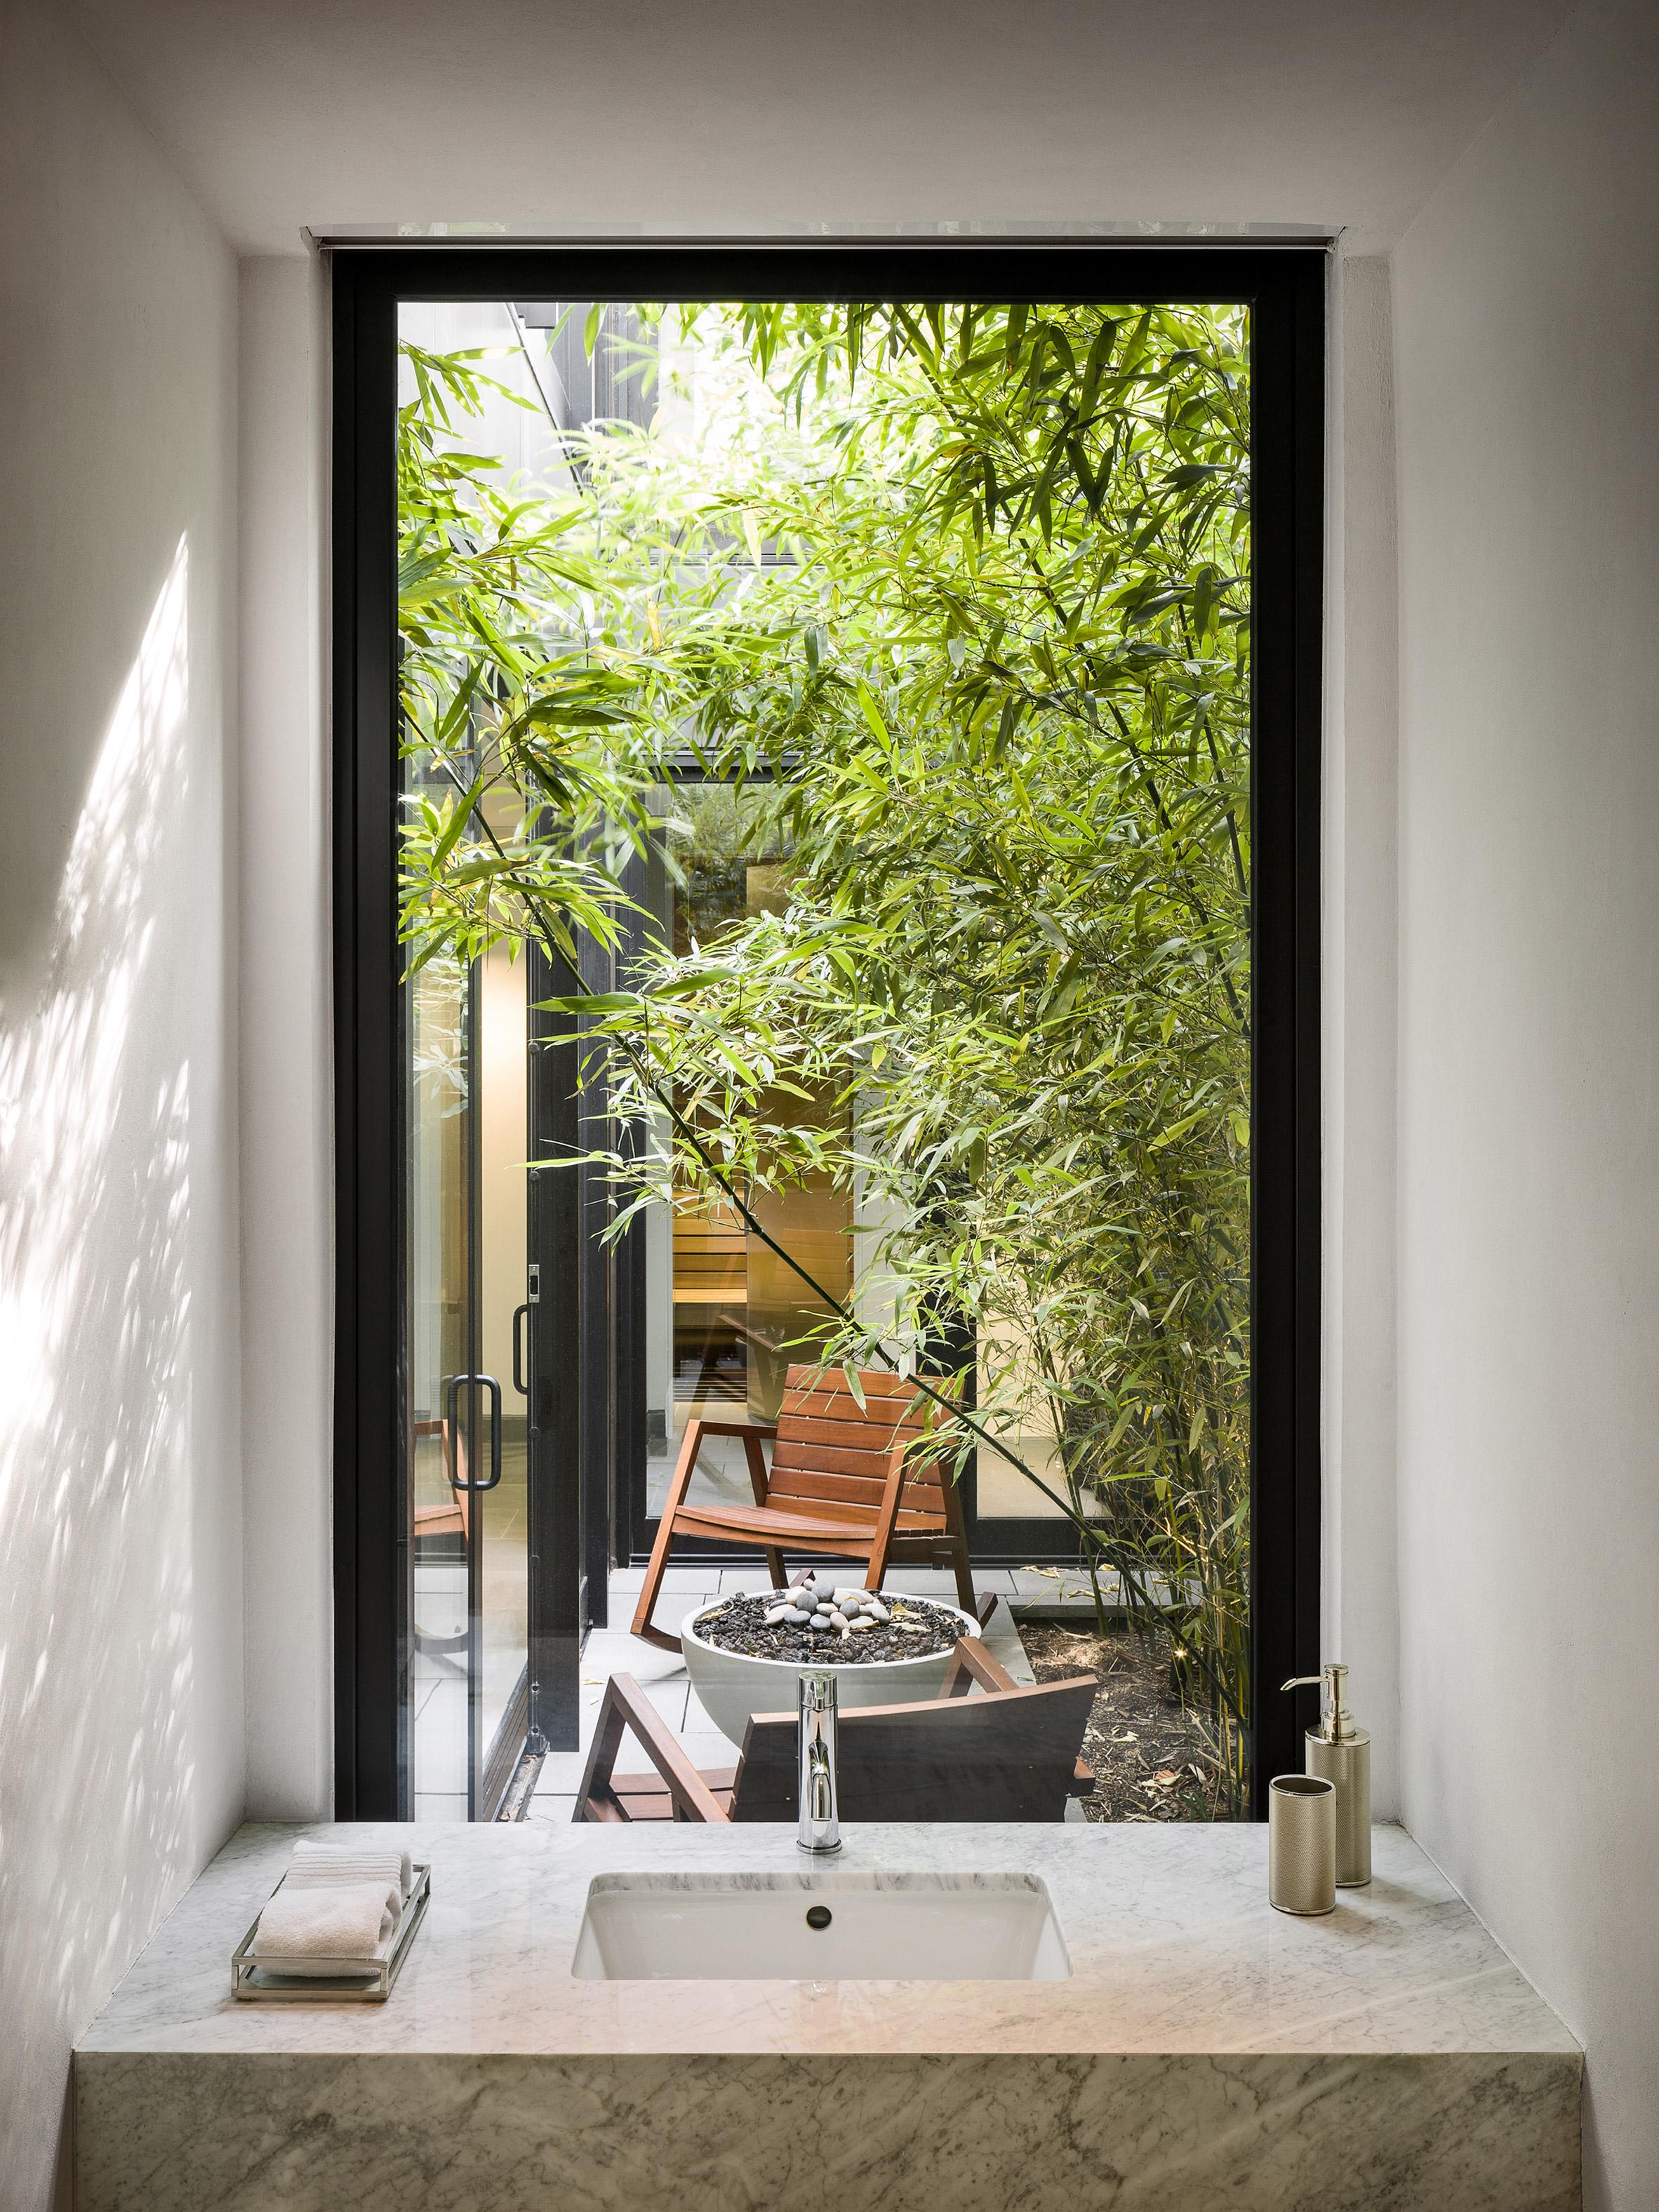 paulus-hook-residence-fogarty-finger-interiors-new-jersey-usa_dezeen_2364_col_6.jpg